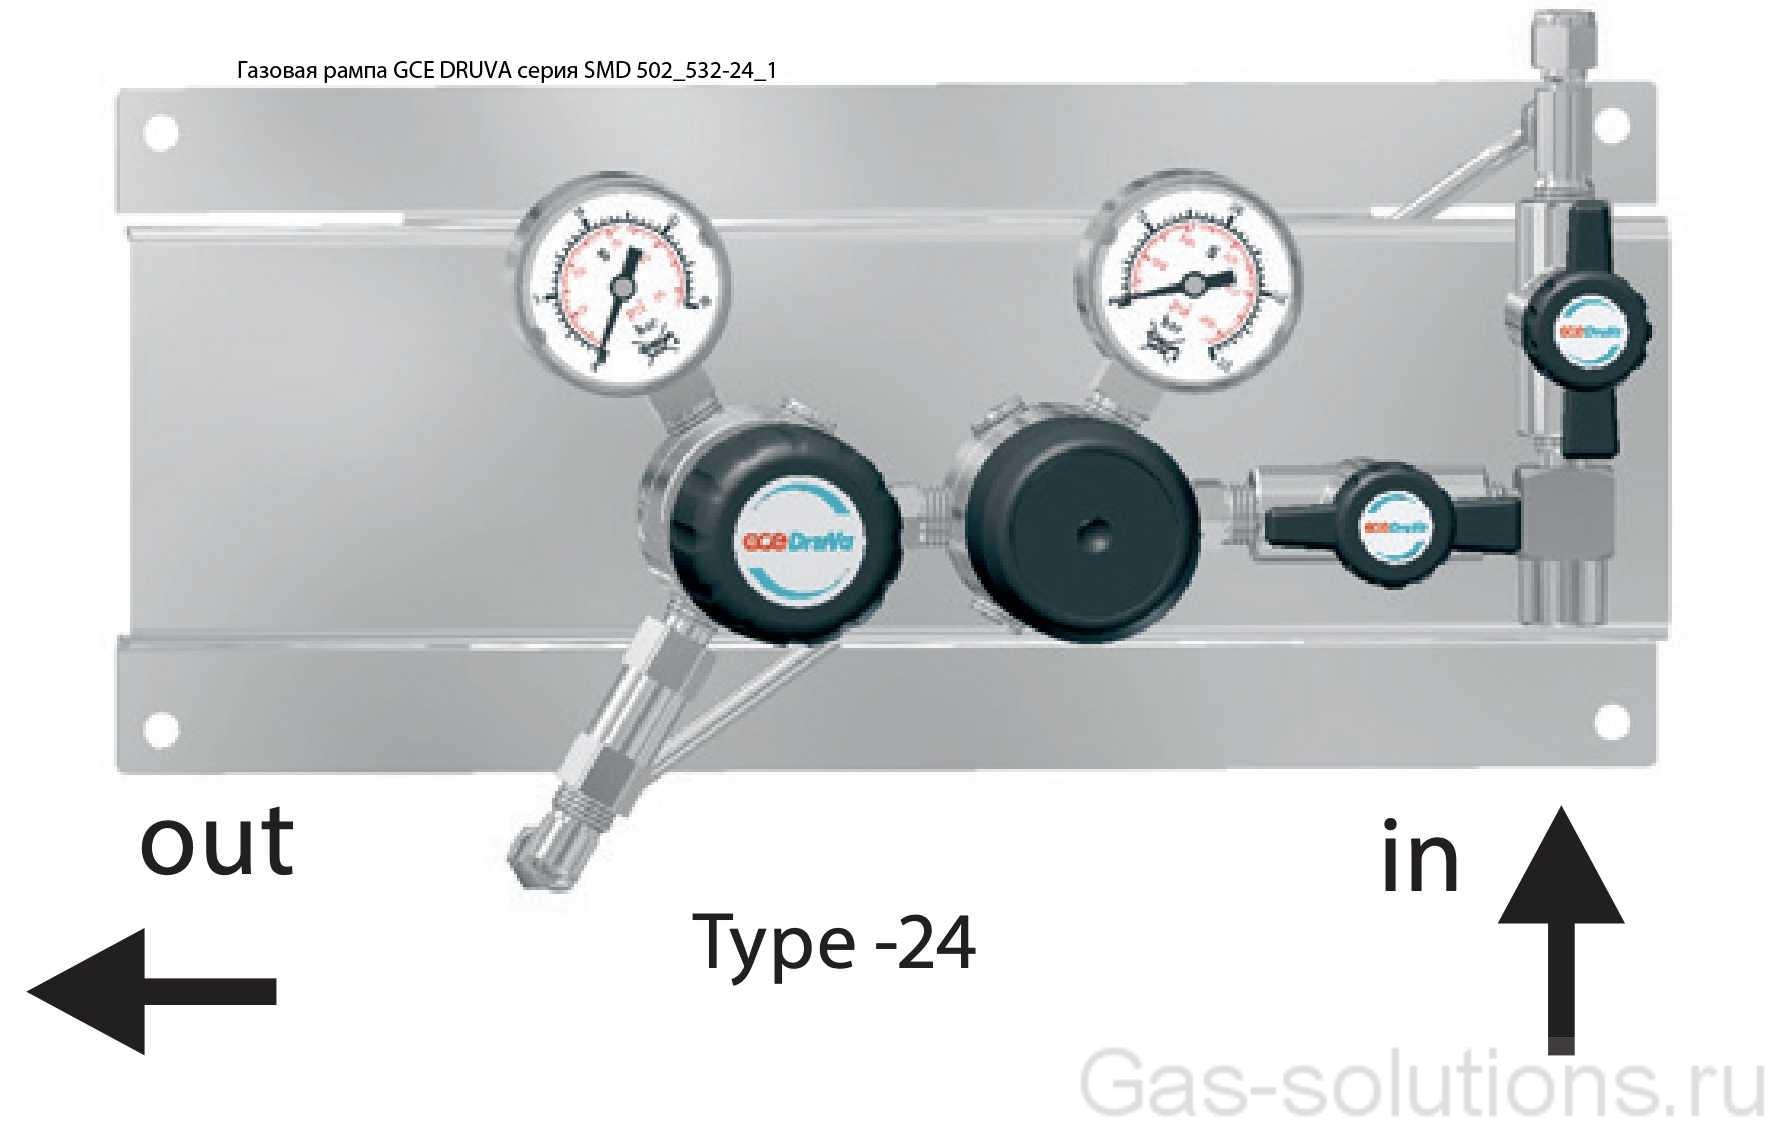 Газовая рампа GCE DRUVA серия SMD 502_532-24_1